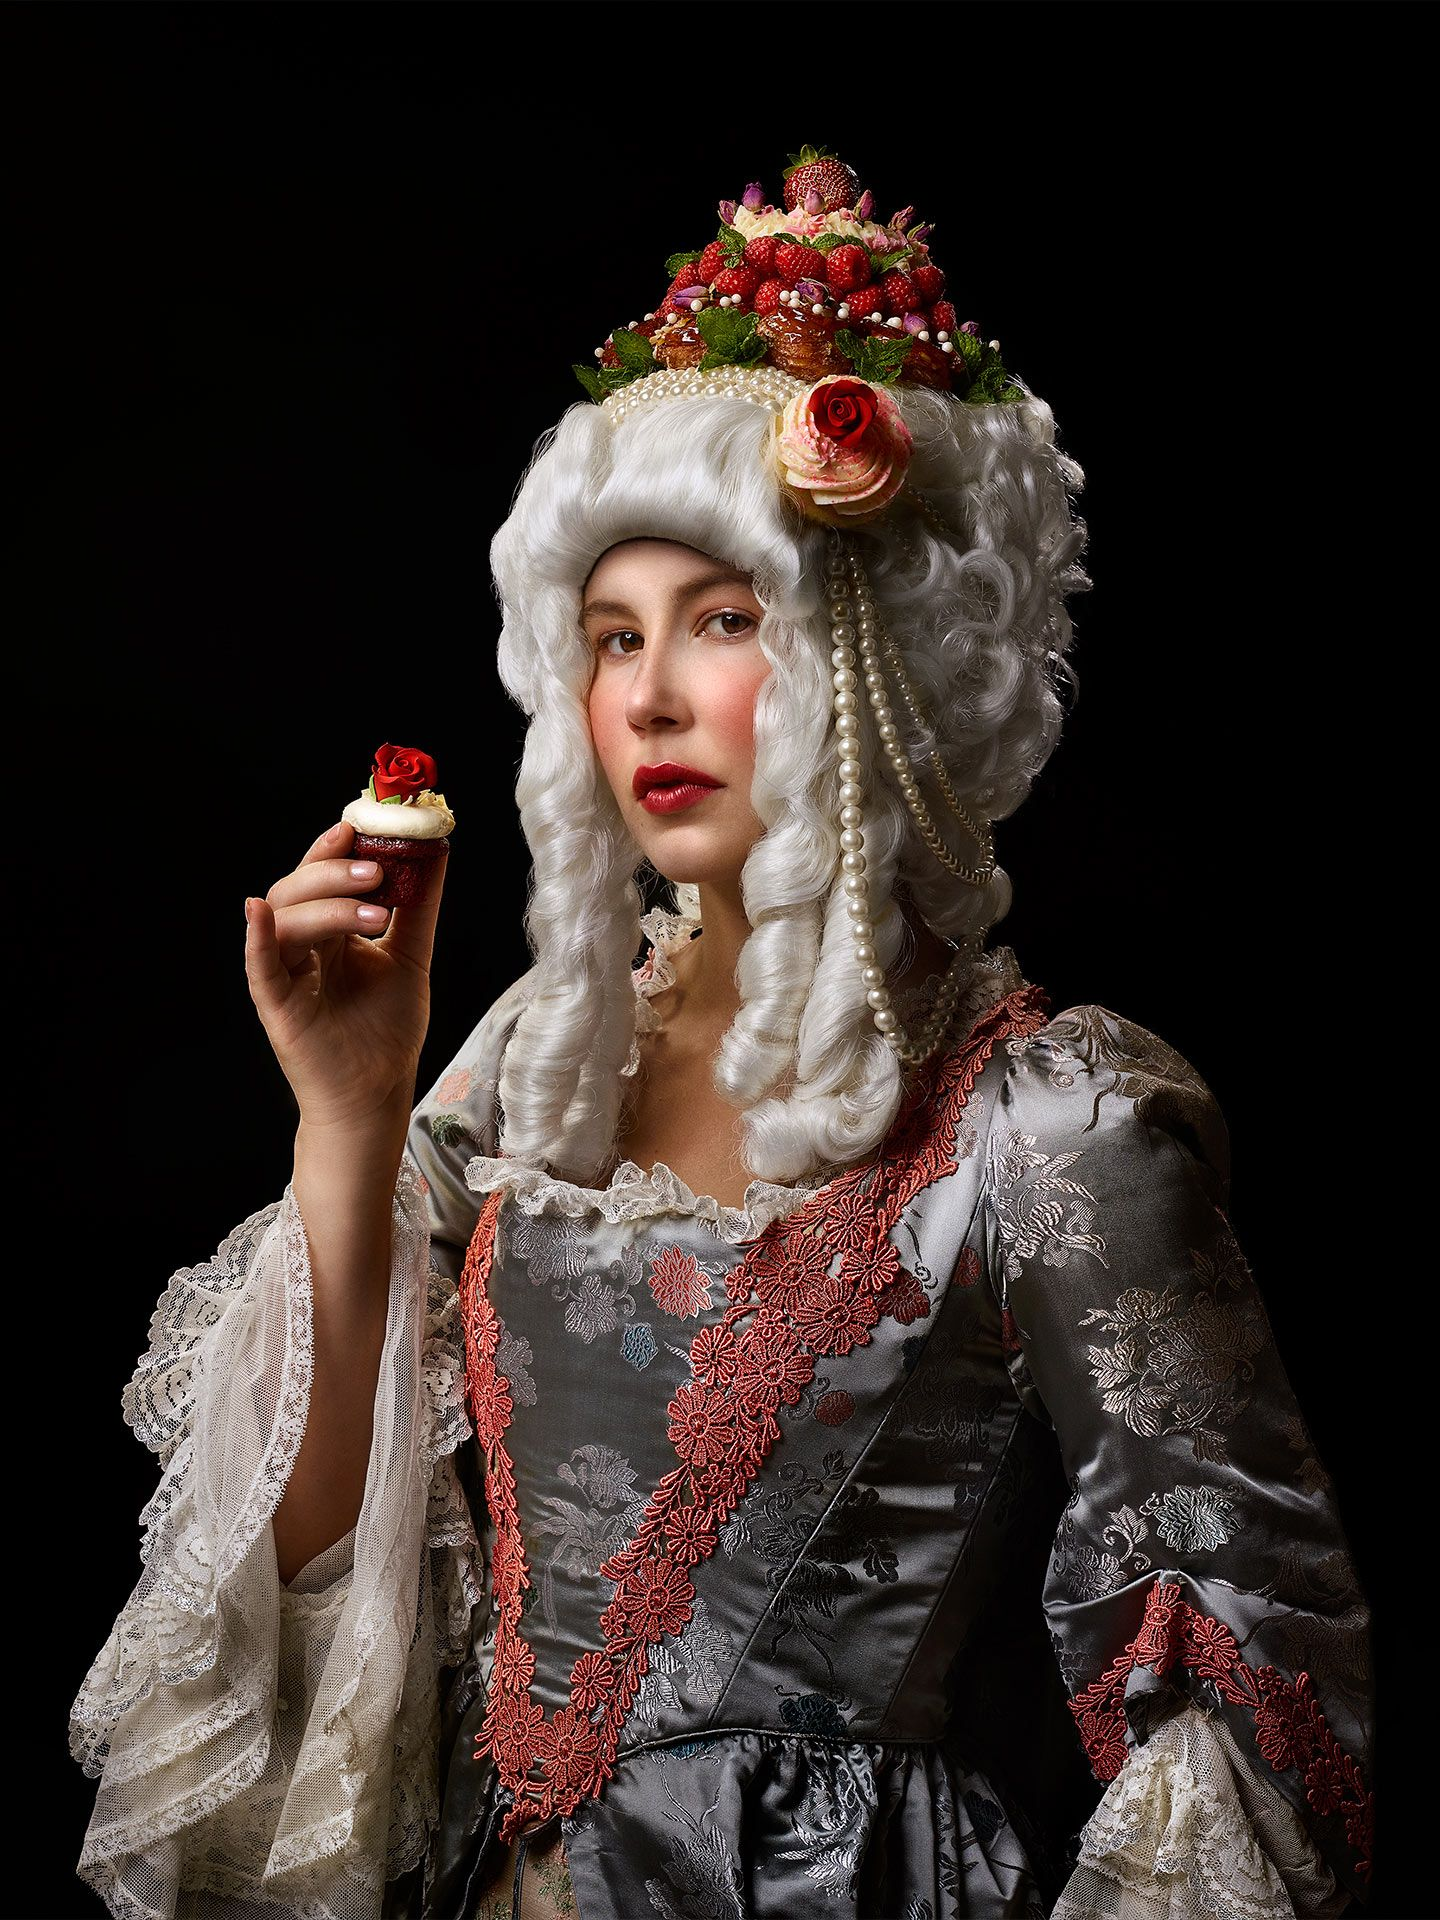 portrait of Juliette Gosselin dressed as Marie Antoinette with cake atop her wig holding a little cupcake by Jocelyn Michel for Voir Guide Restos